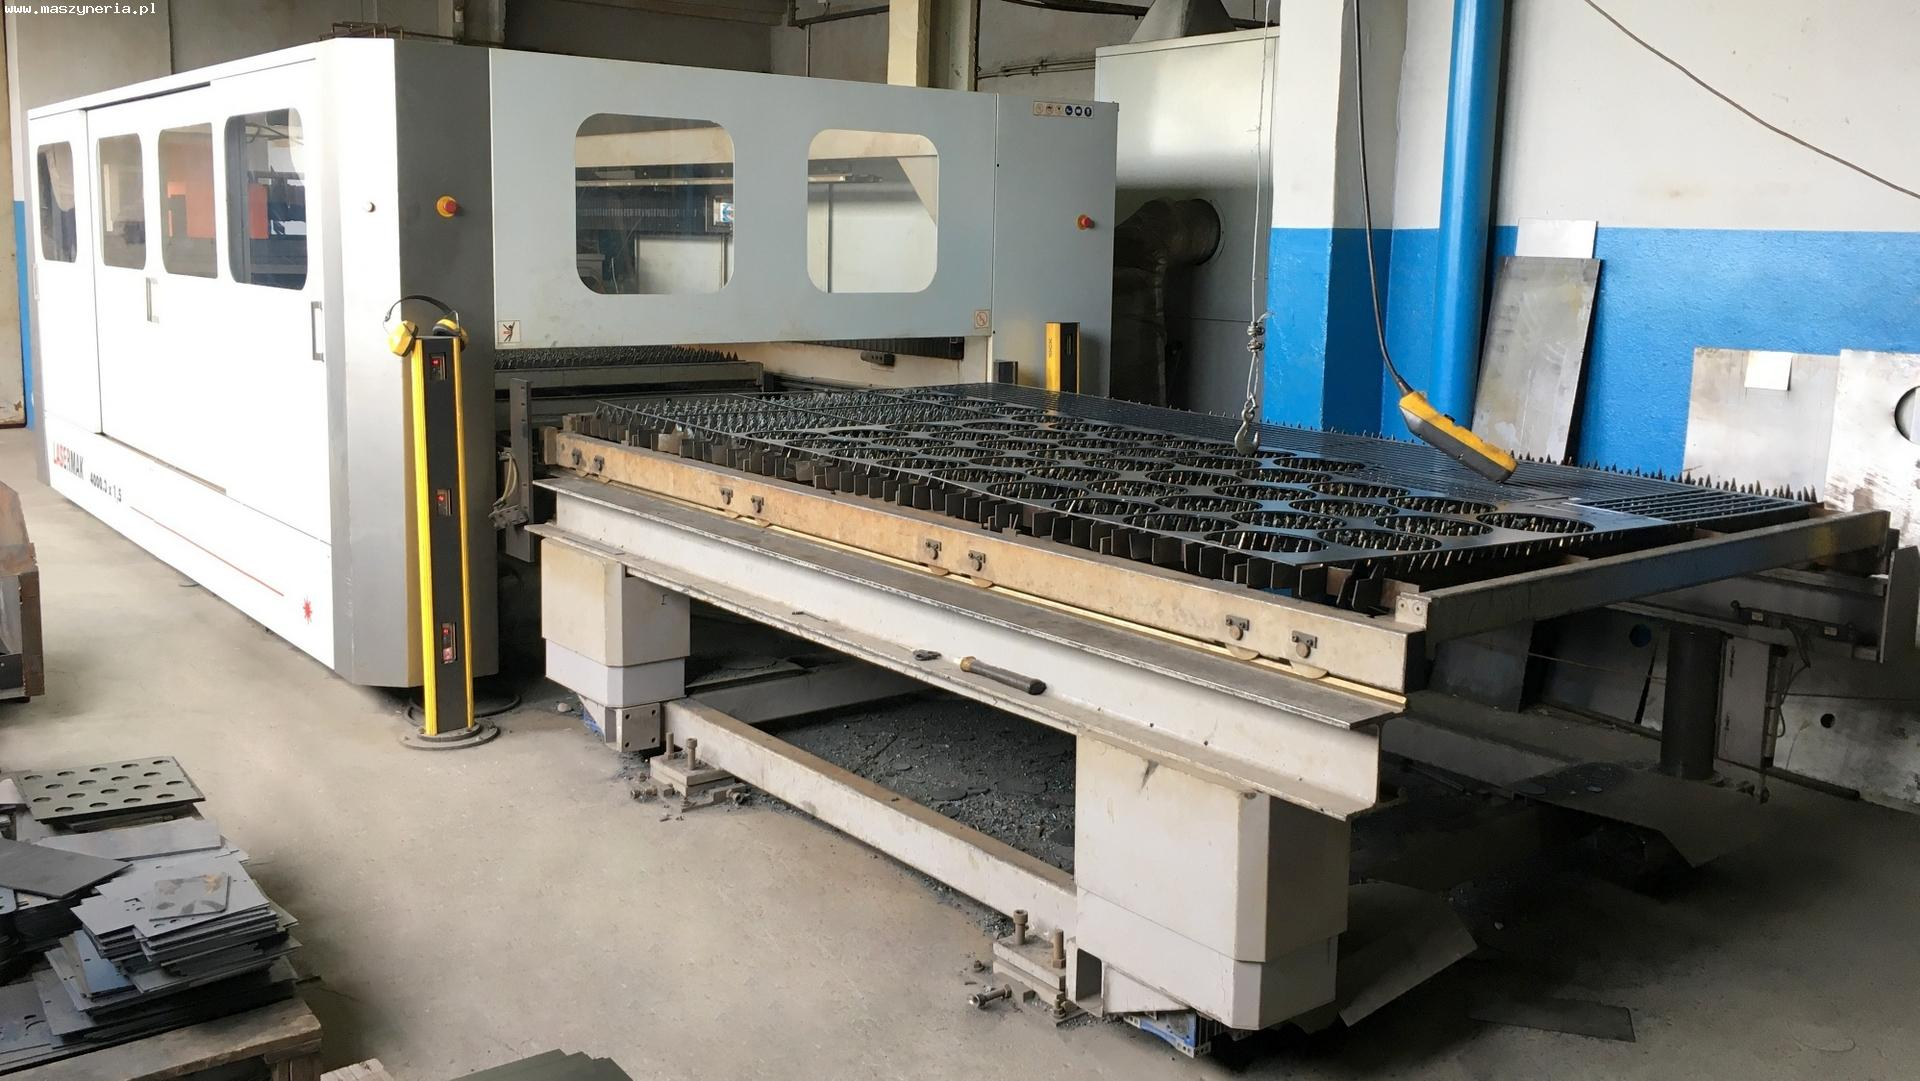 Macchina taglio laser ERMAKSAN LASERMAK 4000,3 x 1,5 in vendita - foto 2